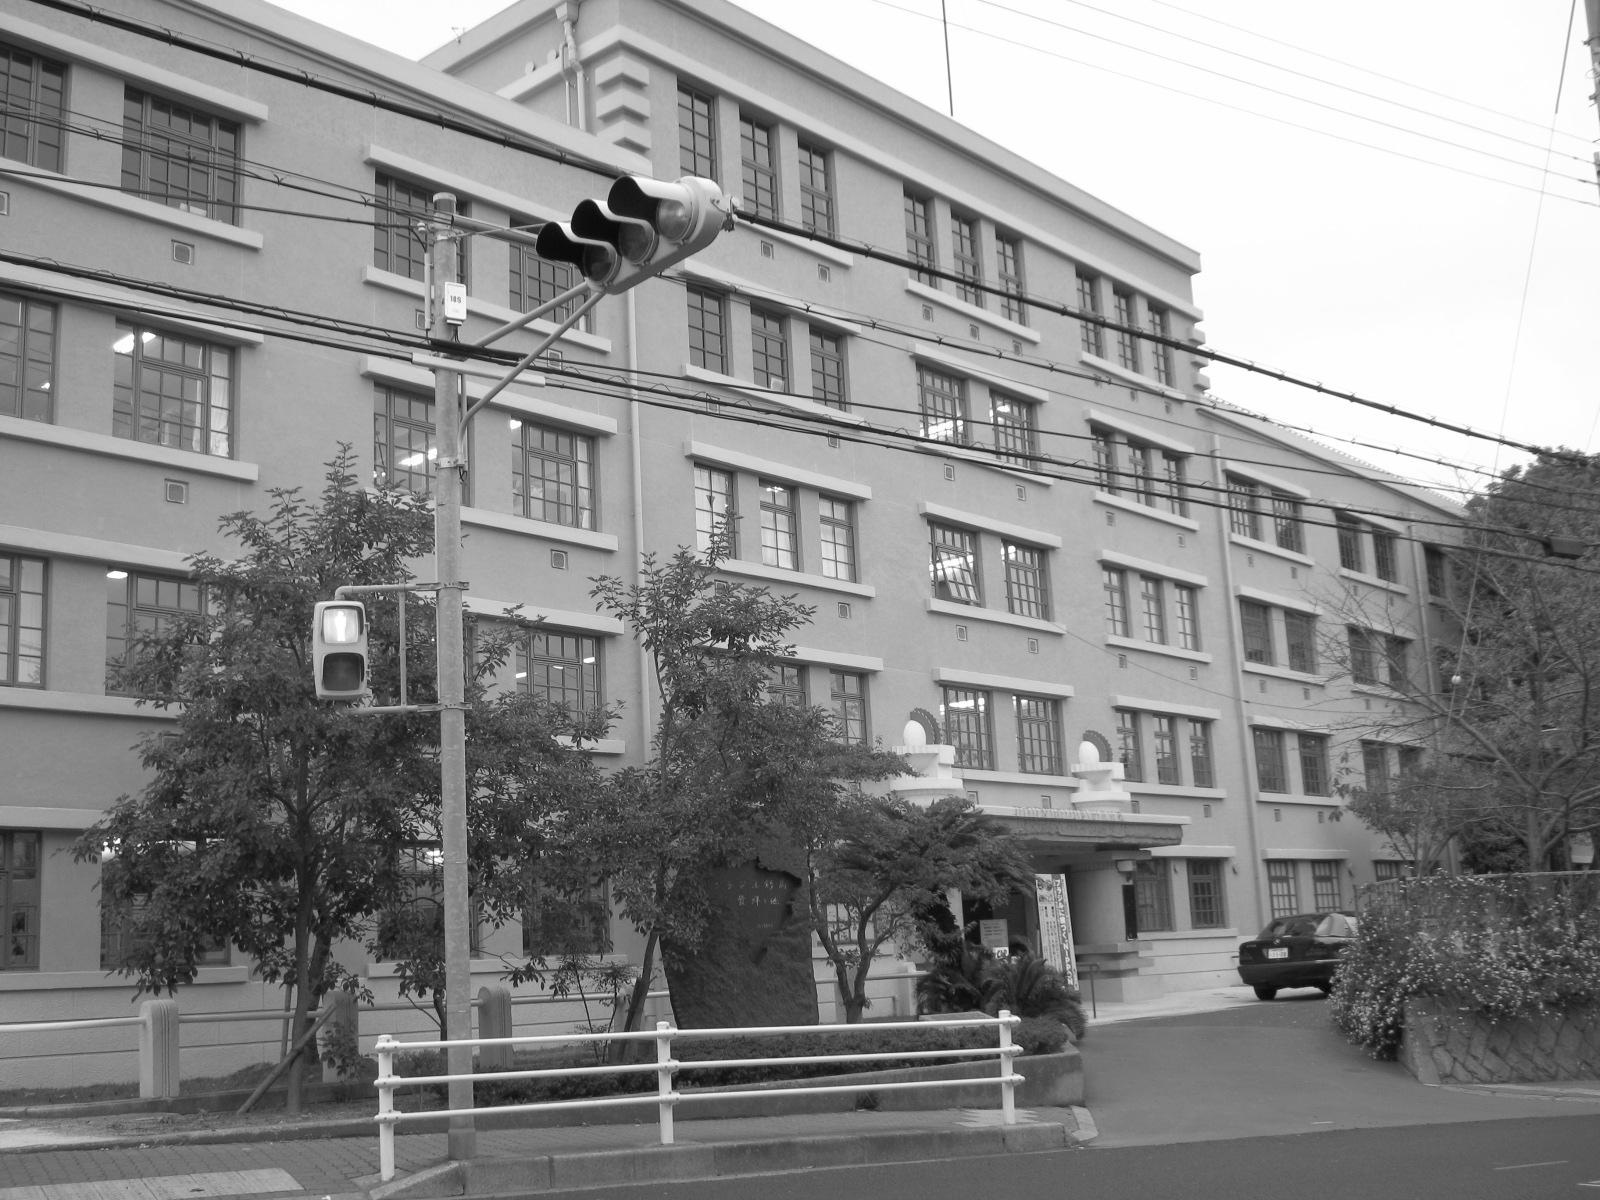 http://kobebonmariage.com/story/images/IMG_0168.JPG